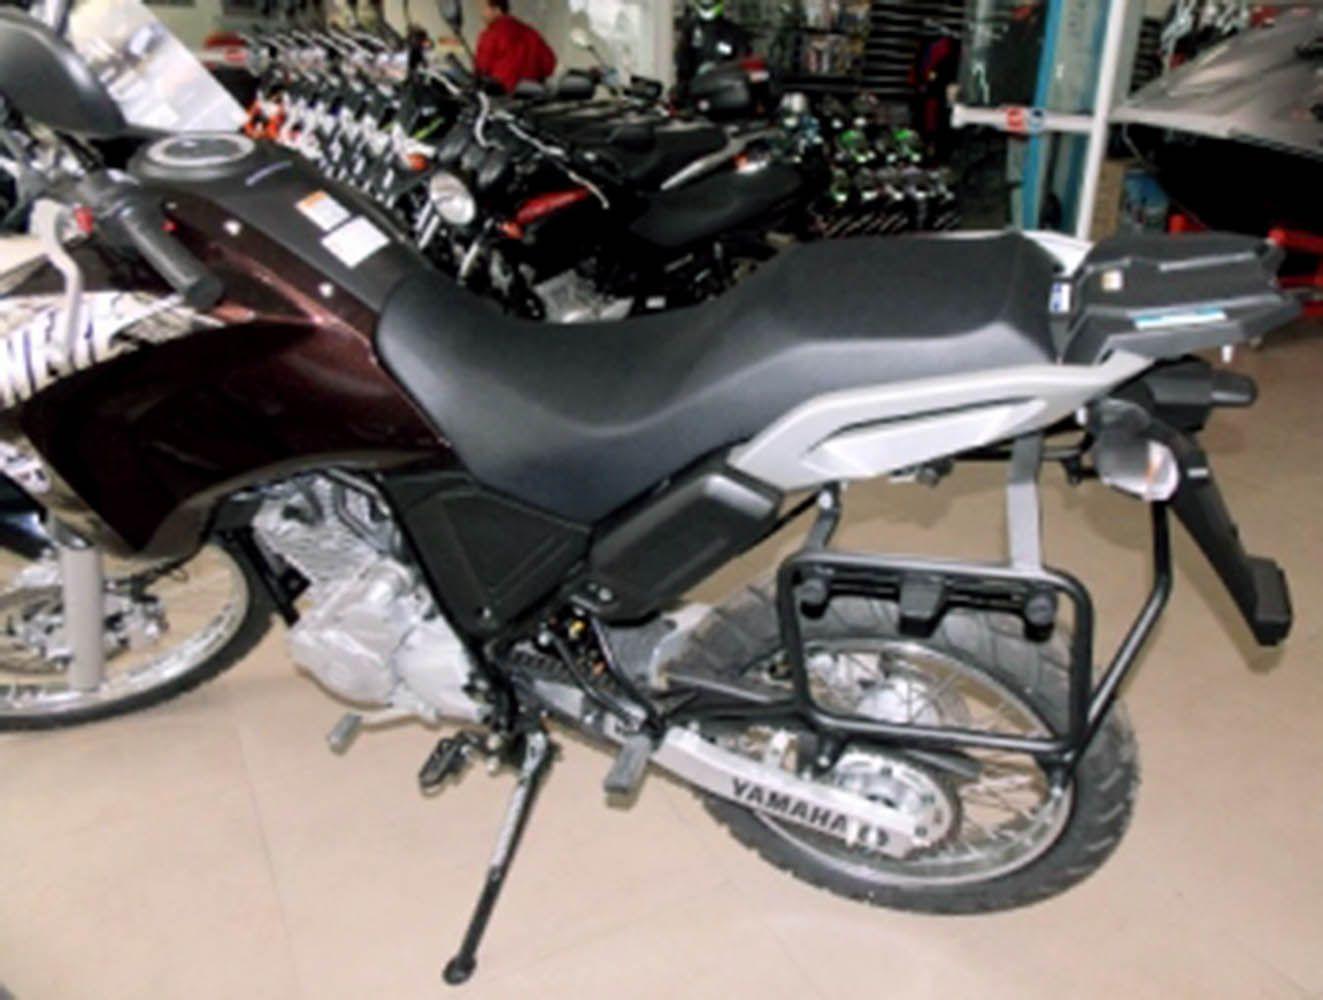 Suporte Bau Lateral Tenere 250 Marca Chapam Baus Givi 9862